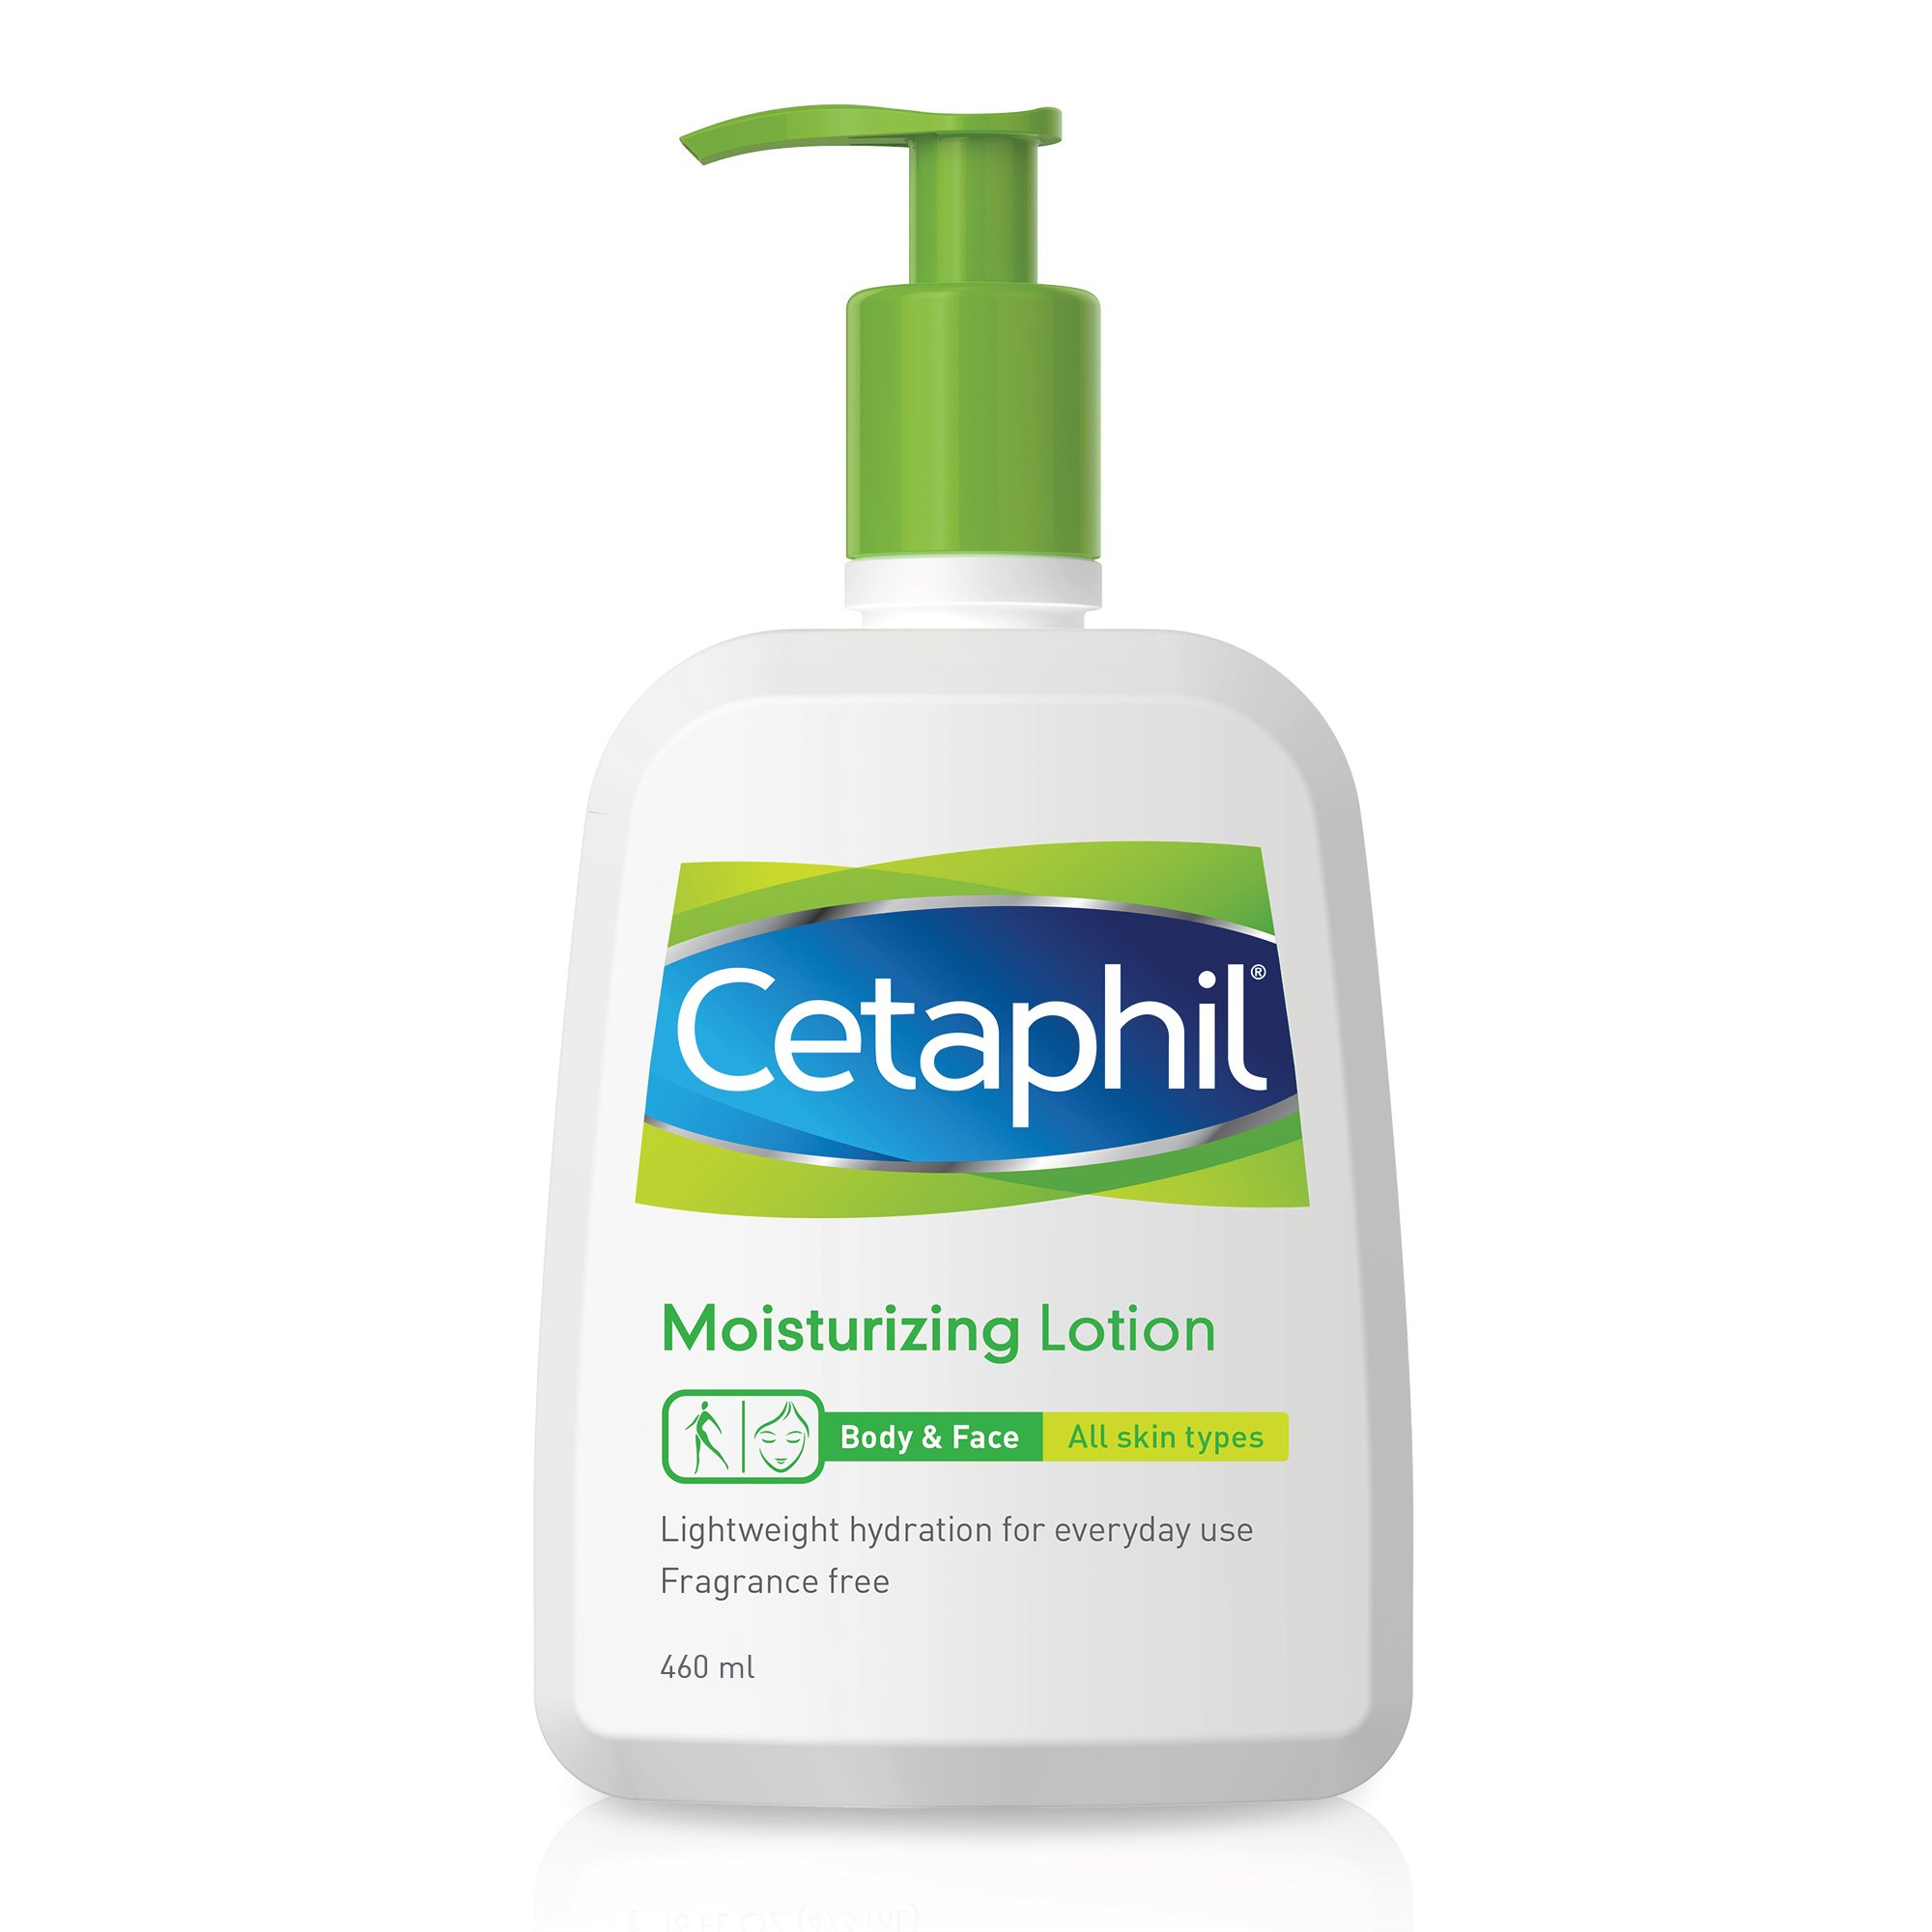 Cetaphil Moisturizer Lotion Ενυδατική Λοσιόν Σώματος για Ευαίσθητο ή Ξηρό Δέρμα 460ml